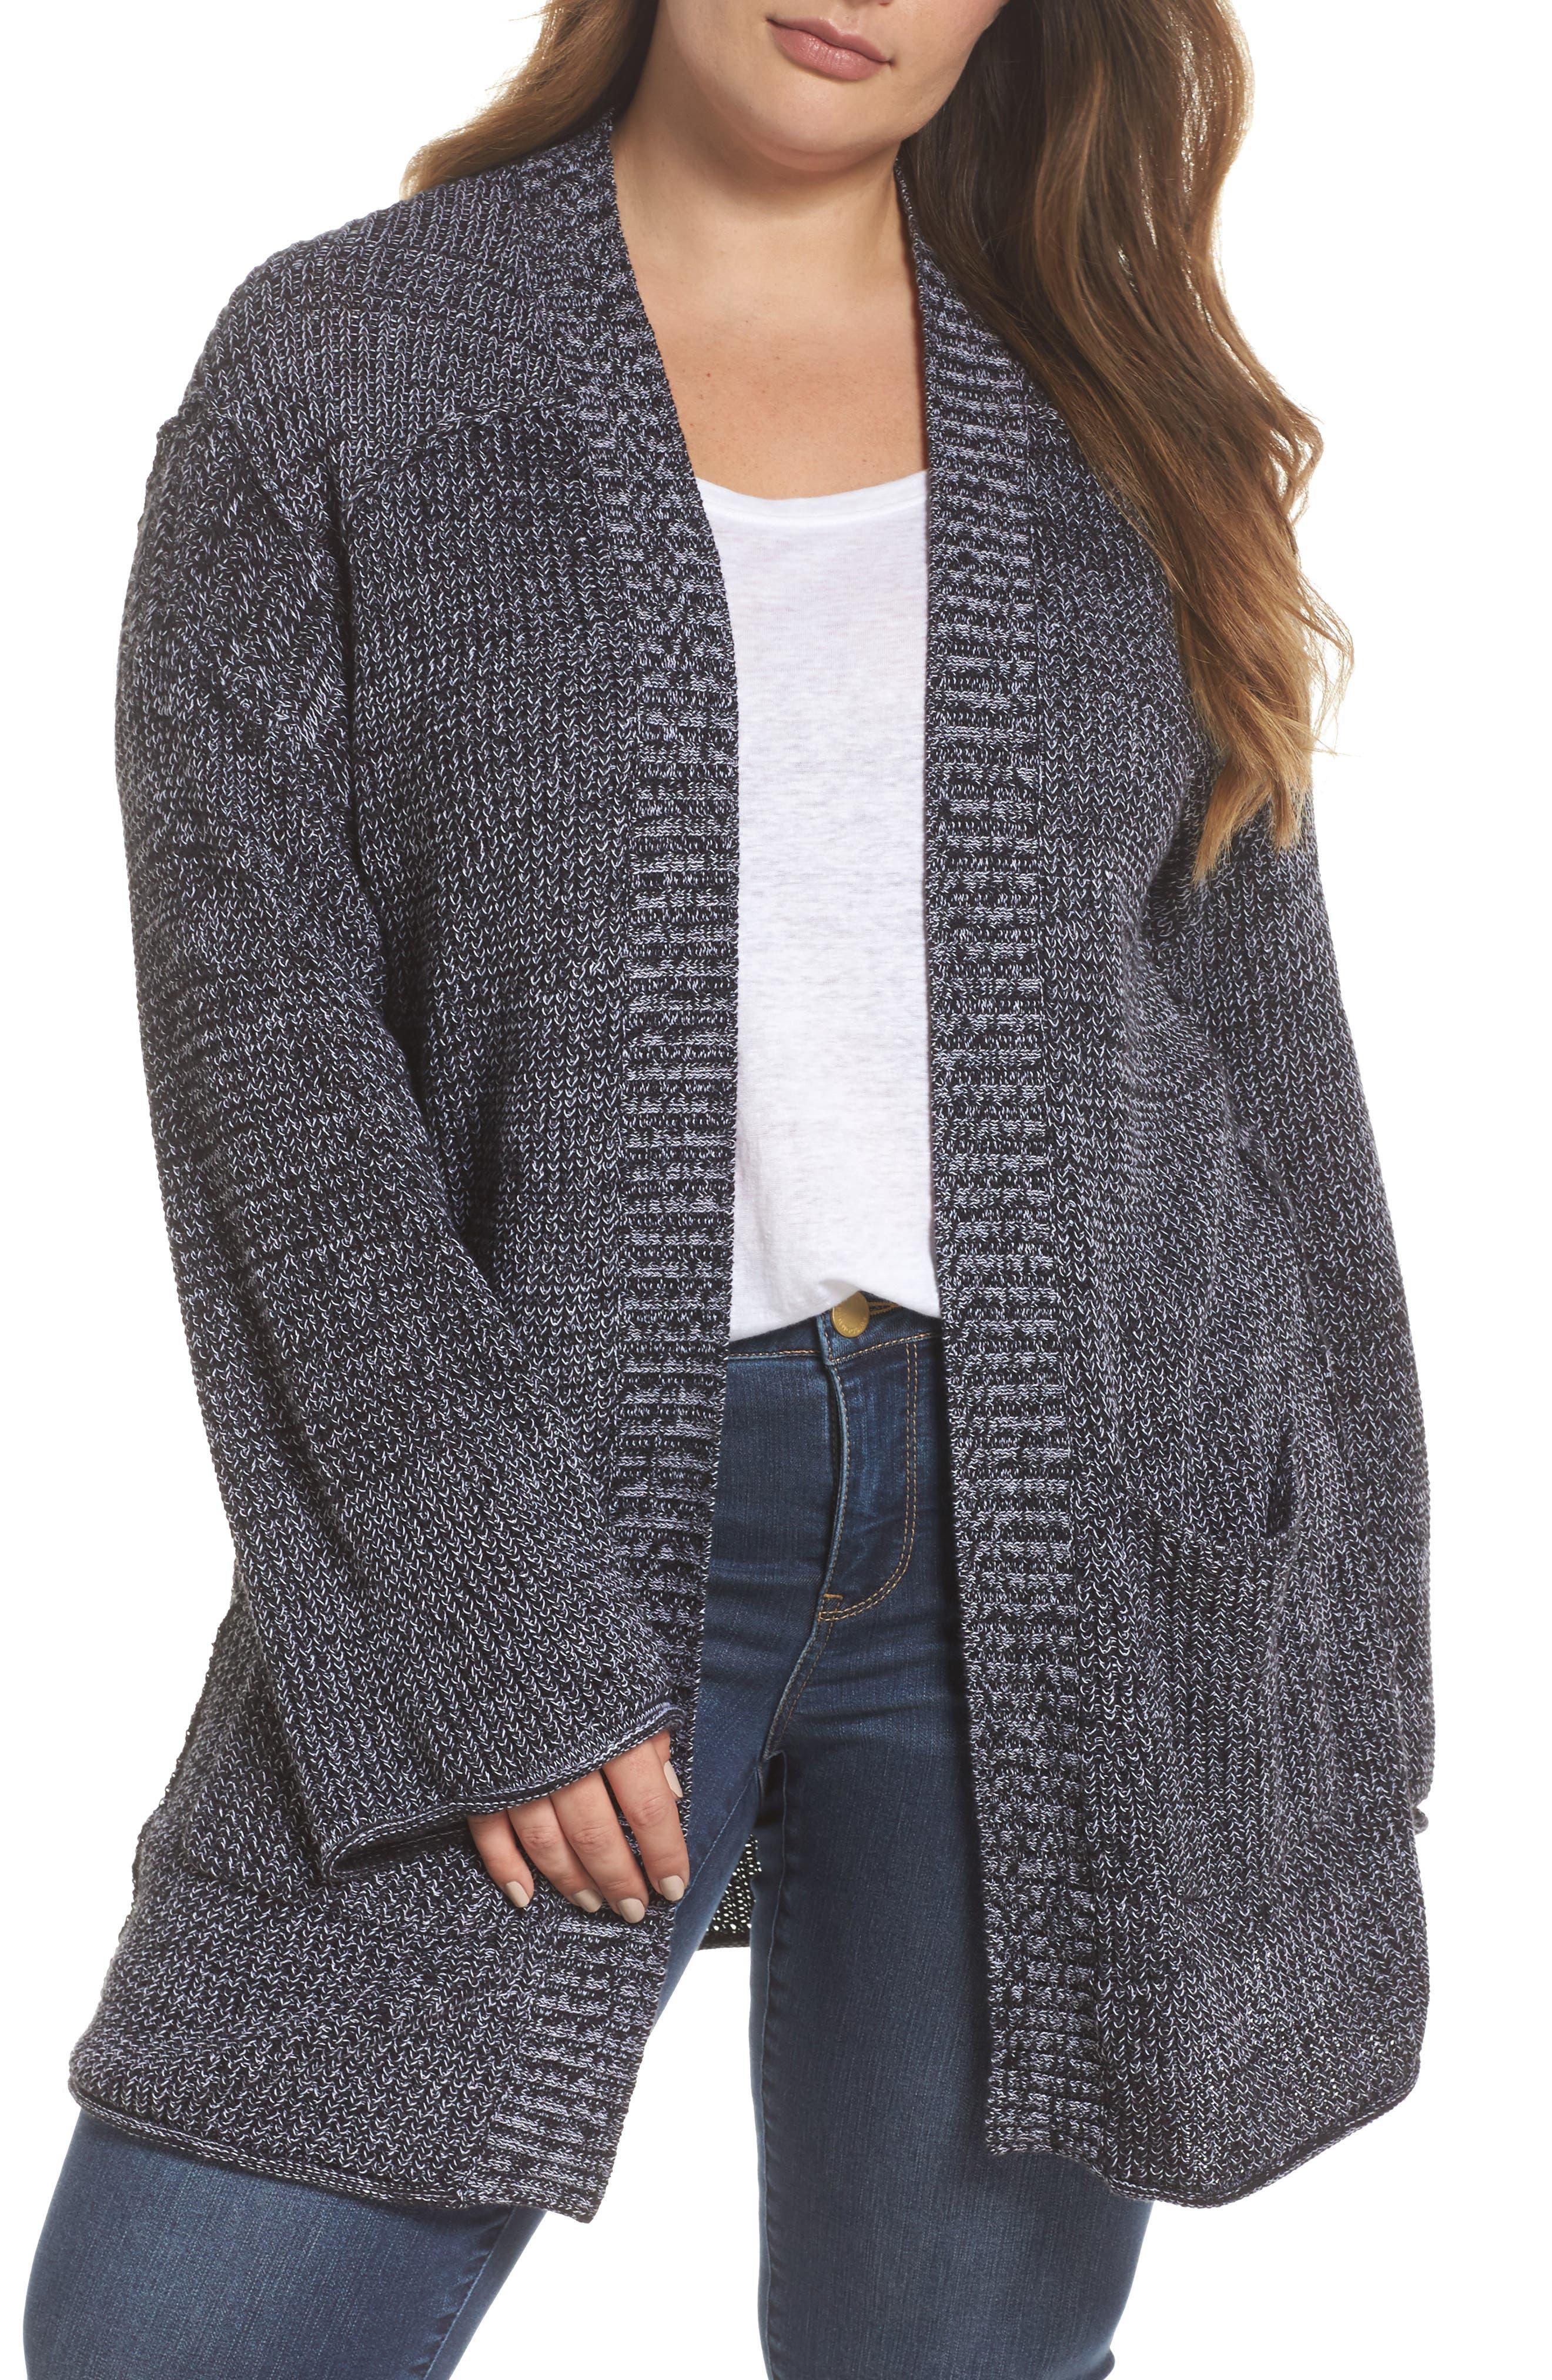 Sweater Knit Cardigan,                         Main,                         color, 001